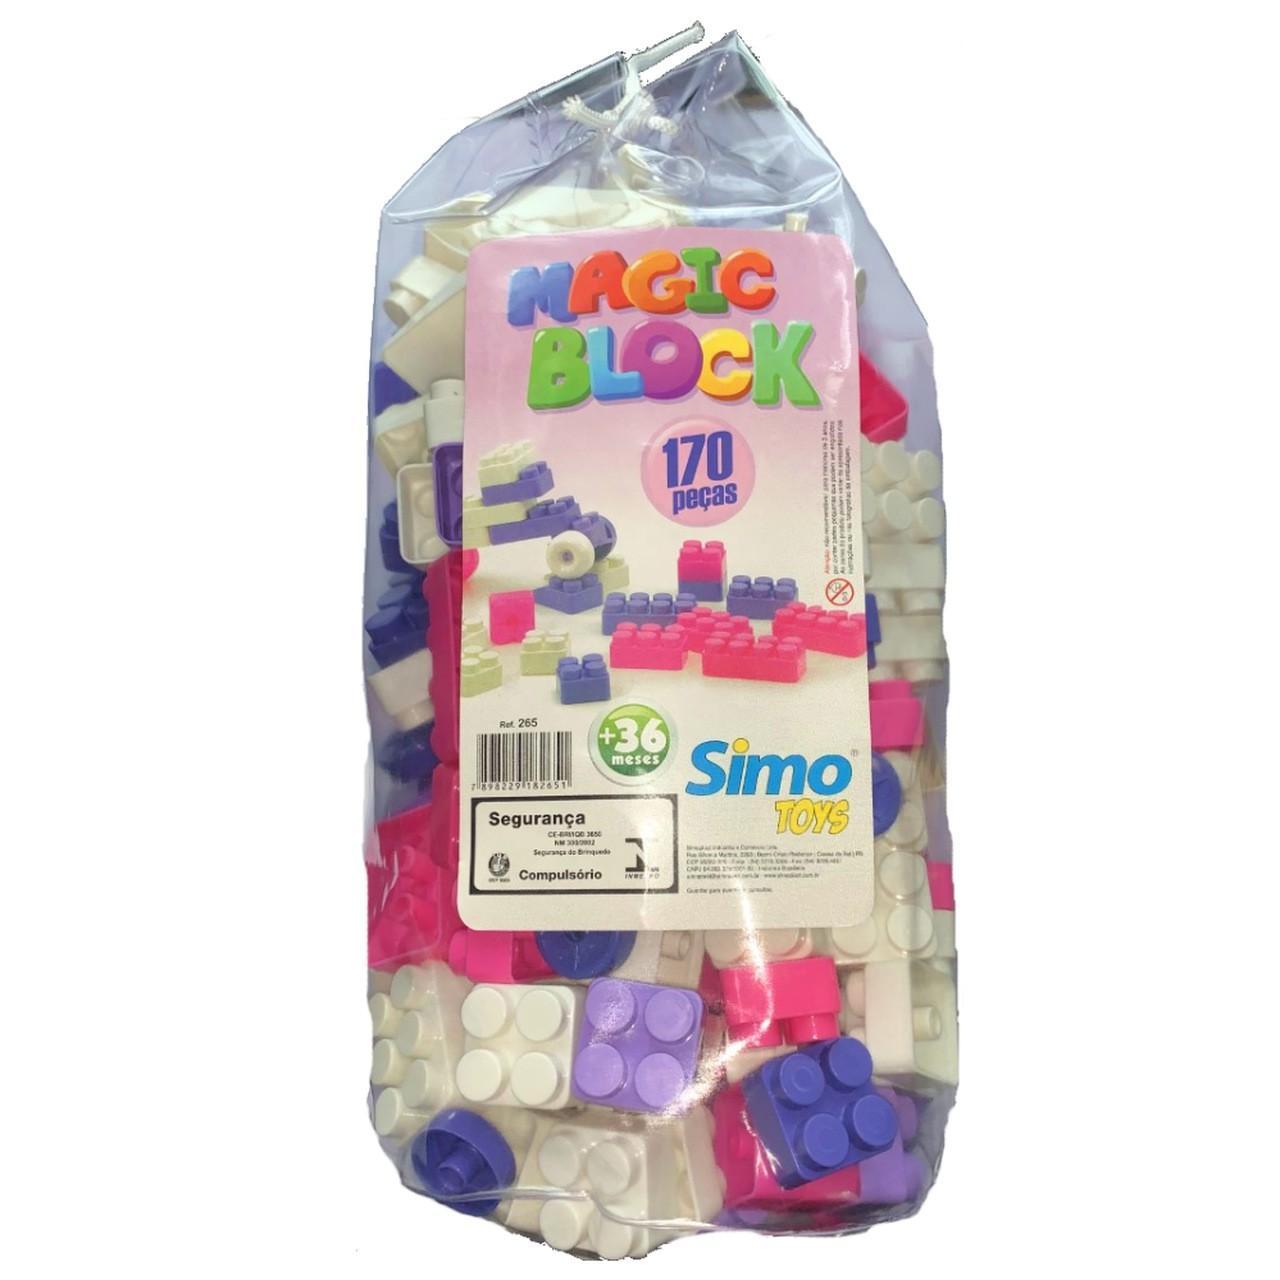 Blocos de Montar Magic Block 170 Peças Rosa - Simo Toys